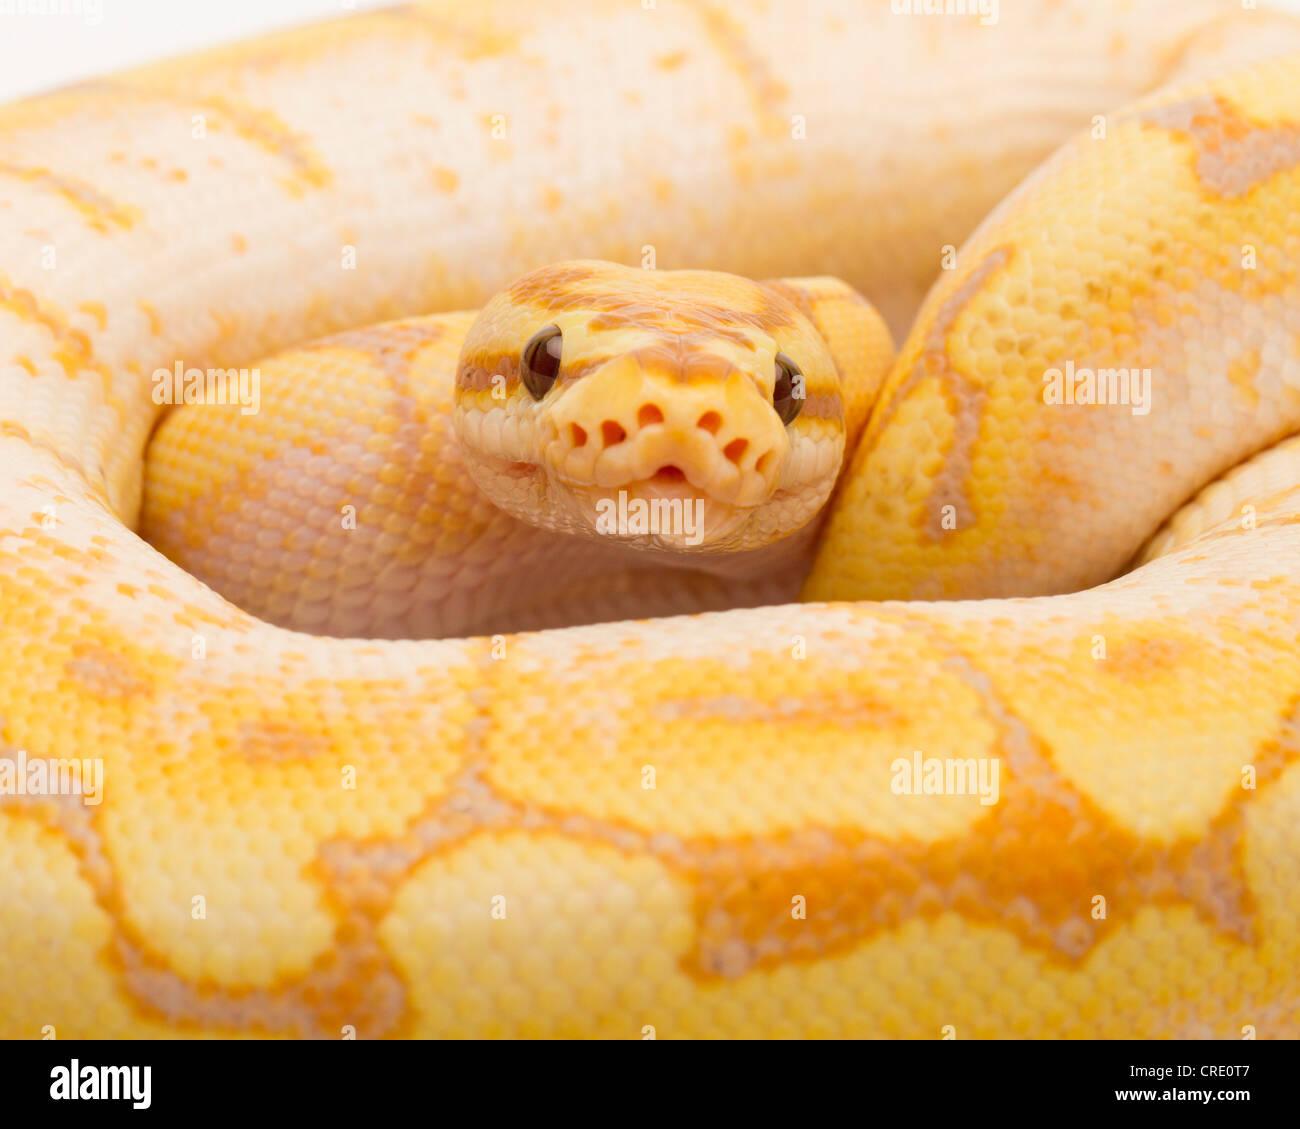 Royal Python (Python regius), Spider CG, male, Willi Obermayer reptile breeding, Austria - Stock Image